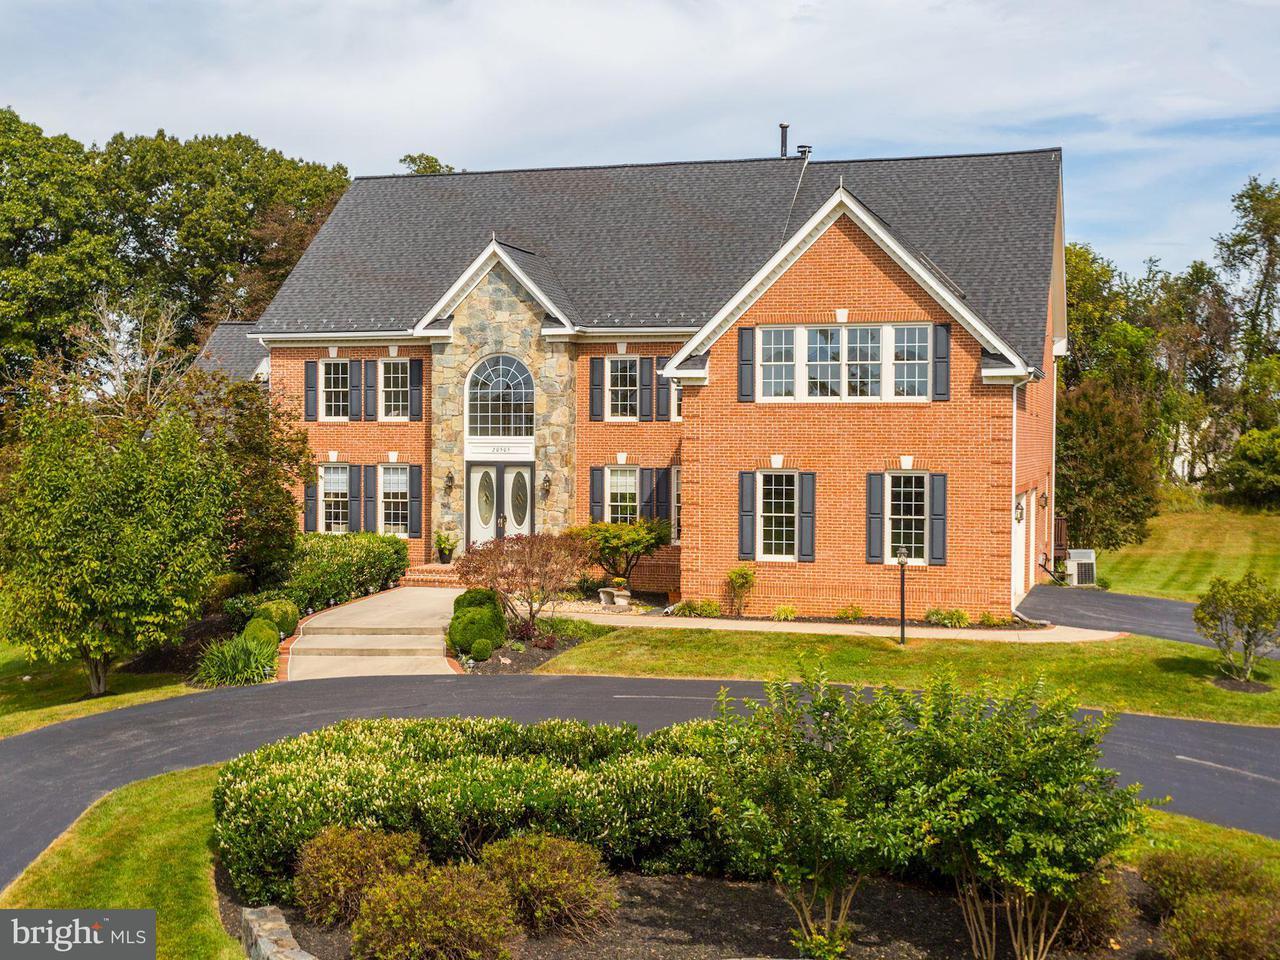 Casa Unifamiliar por un Venta en 20505 Bordly Court 20505 Bordly Court Brookeville, Maryland 20833 Estados Unidos